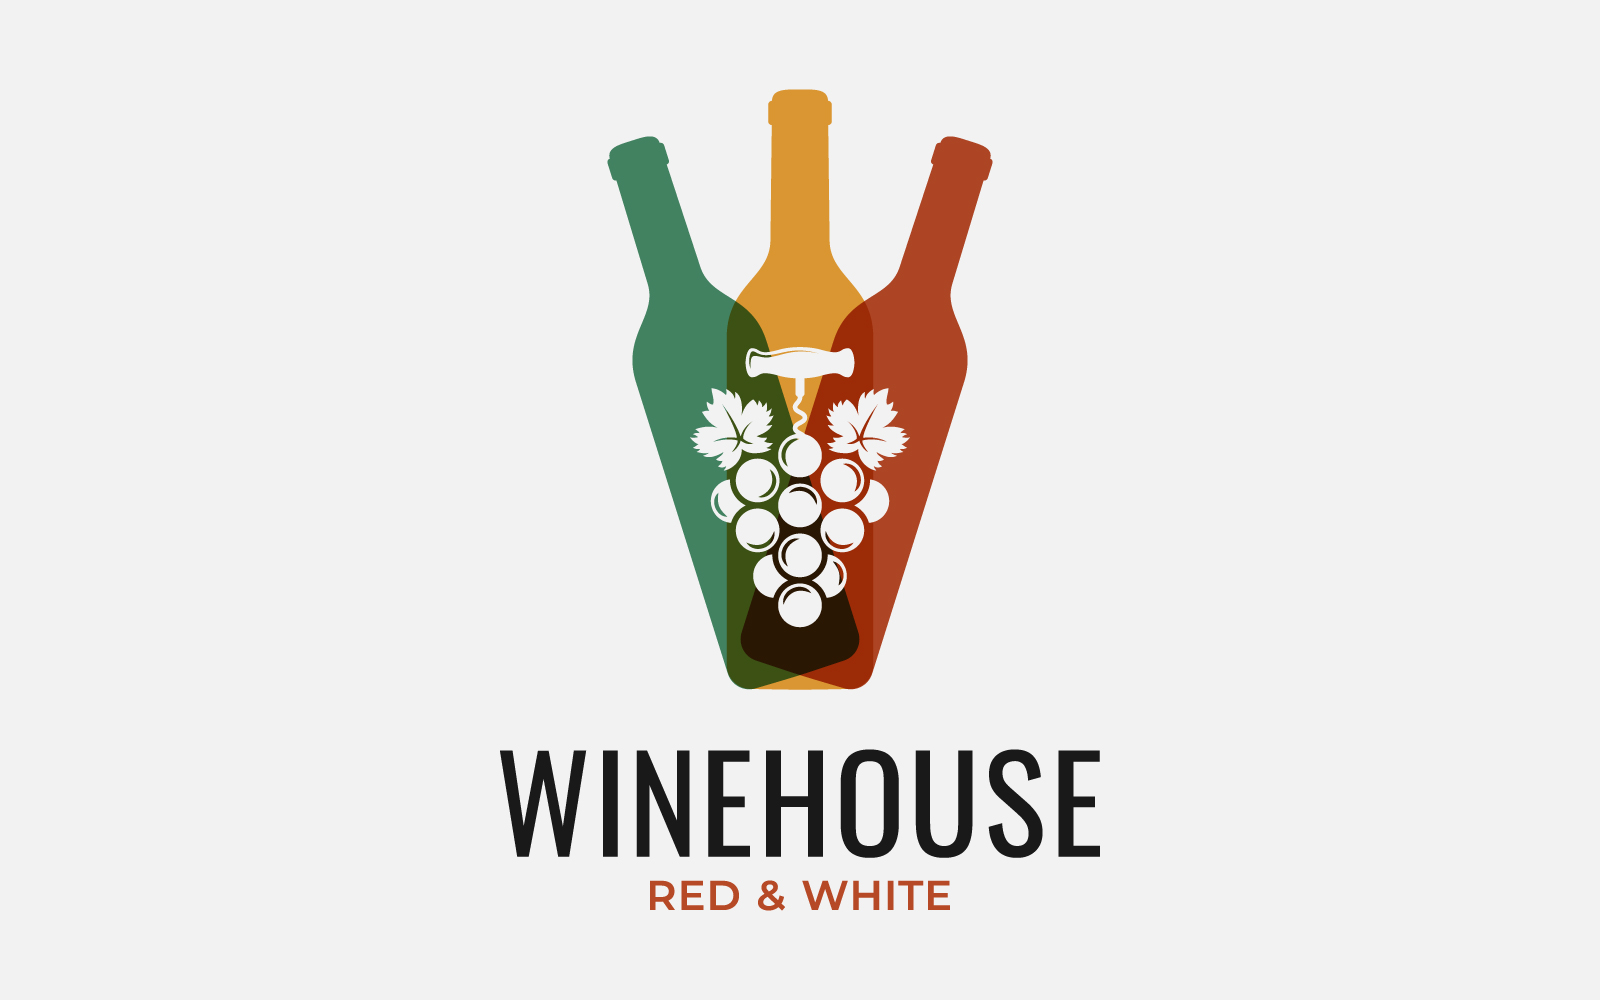 """WIne Bottles. Wine Grapes."" logo标志模板 #126095"